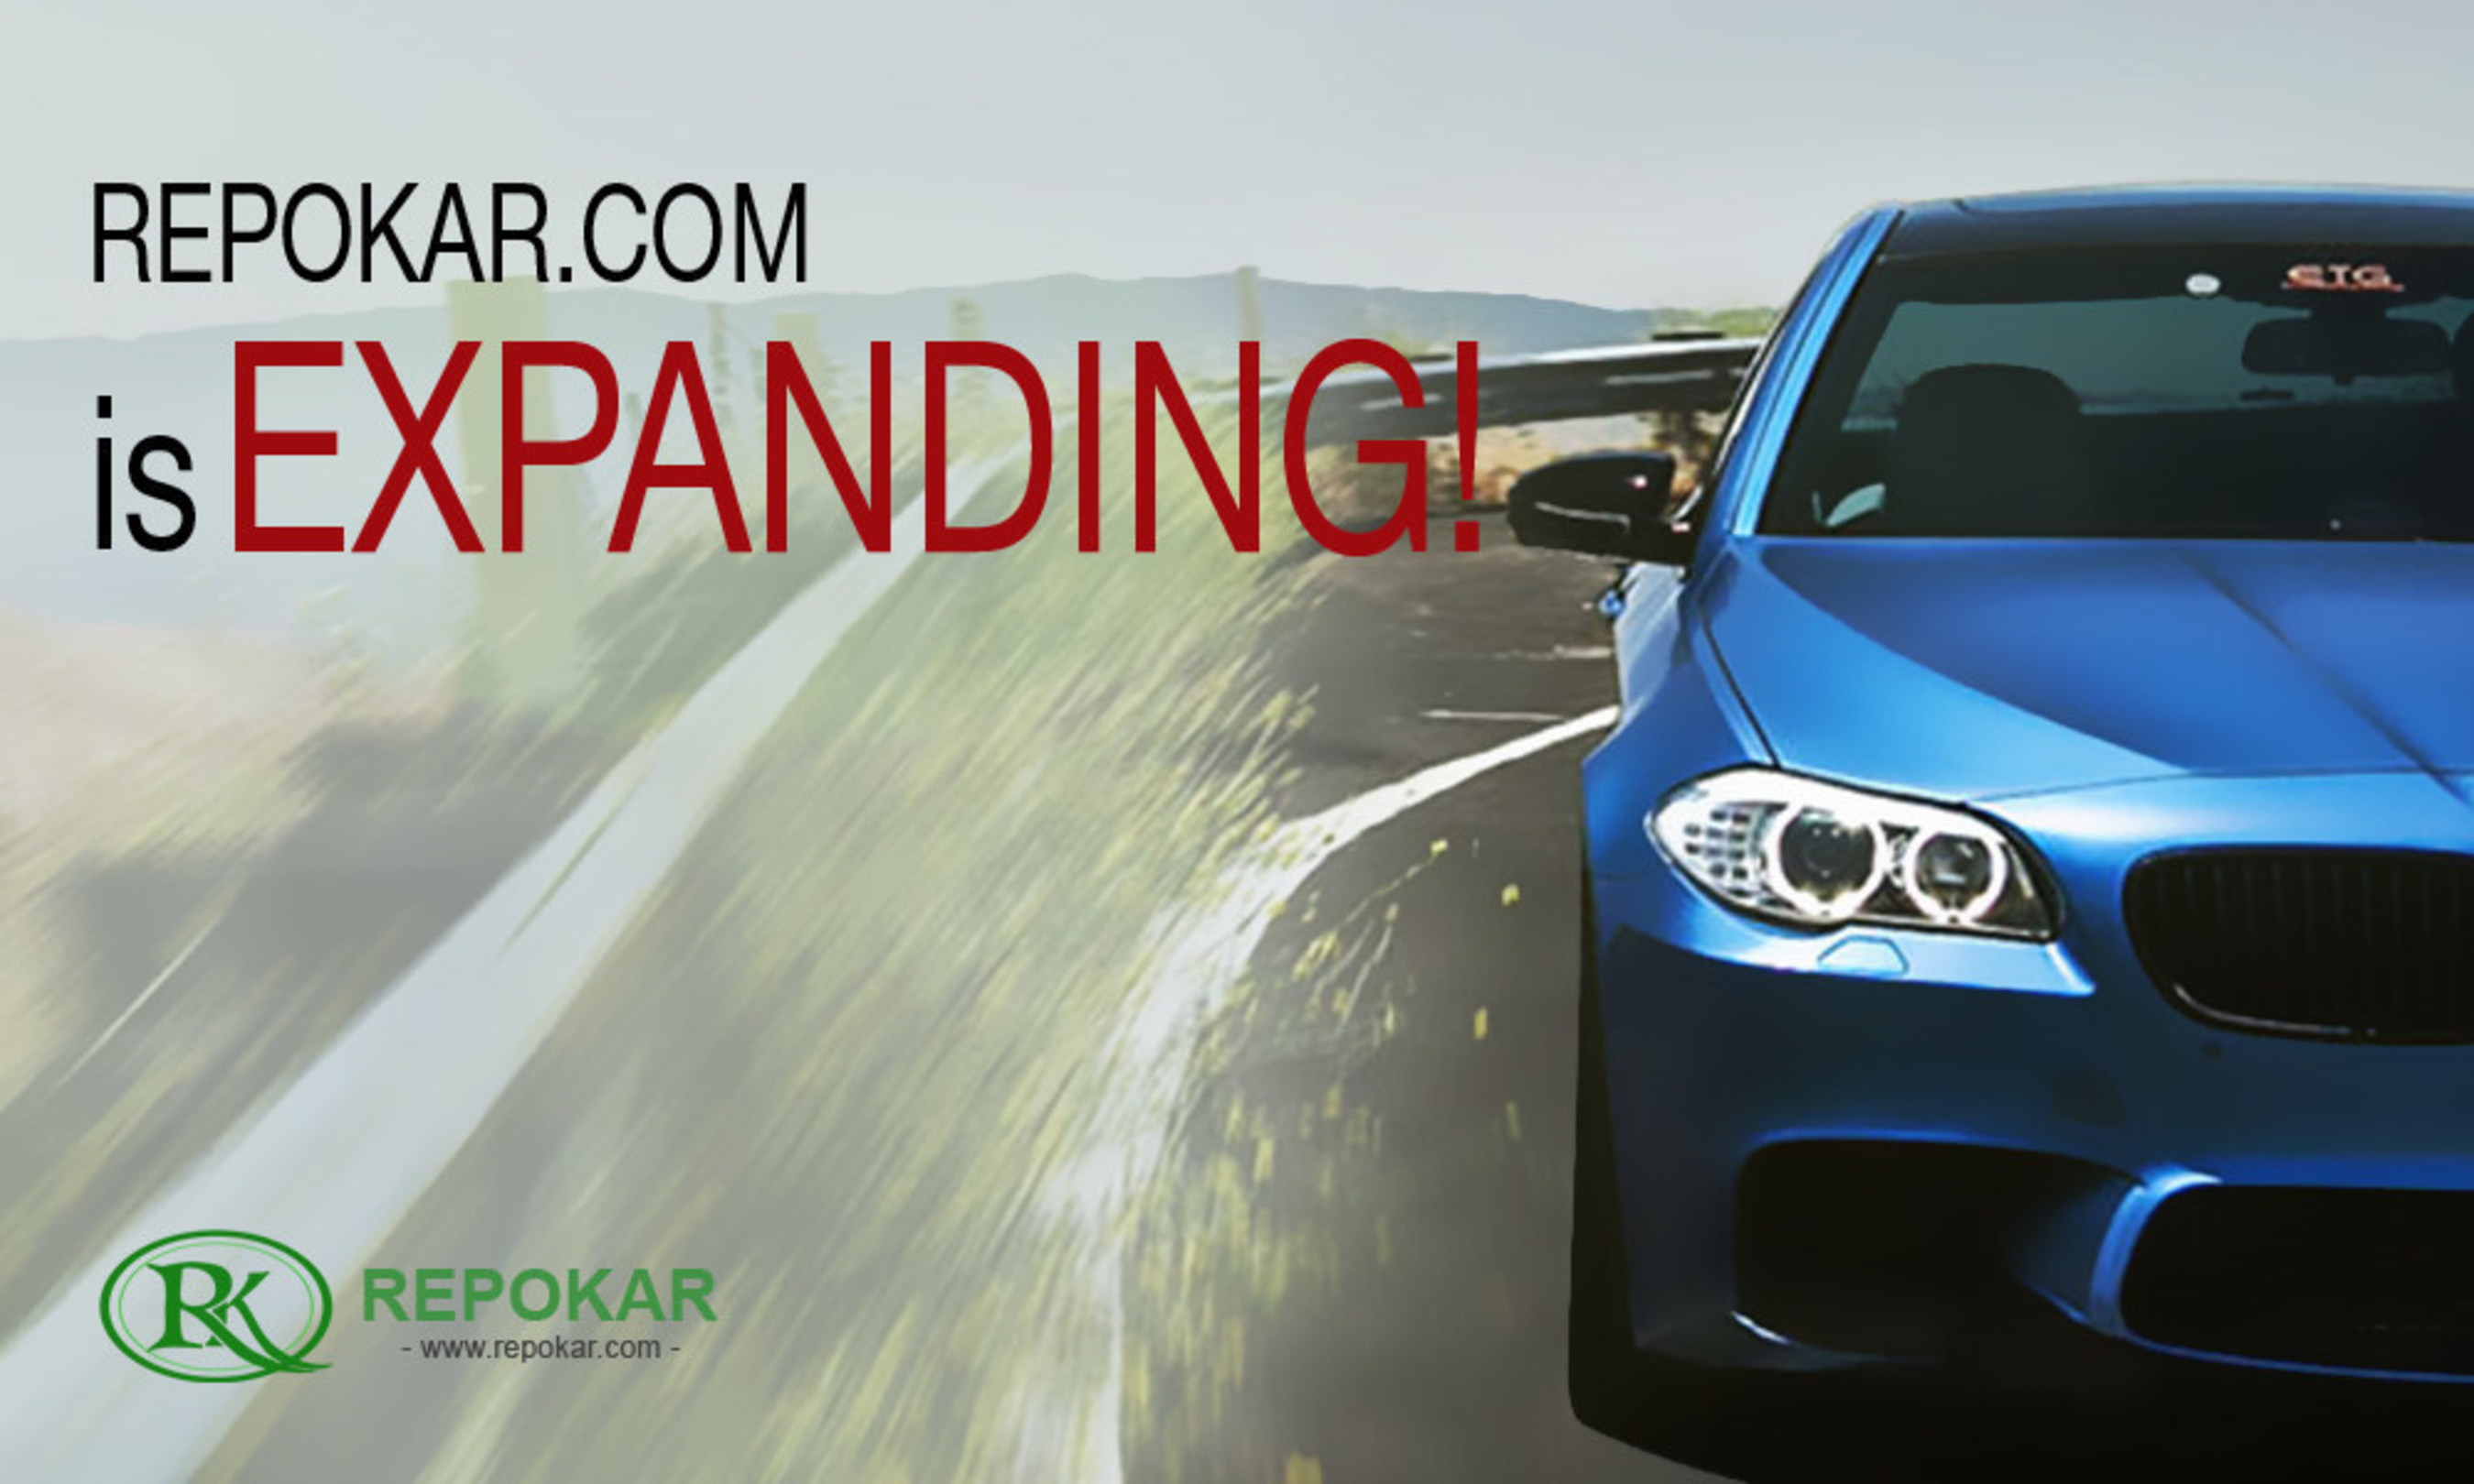 REPOKAR.COM IS EXPANDING! ANNOUNCES BUY OUT OF PRIVATE AUCTION COMPANIES